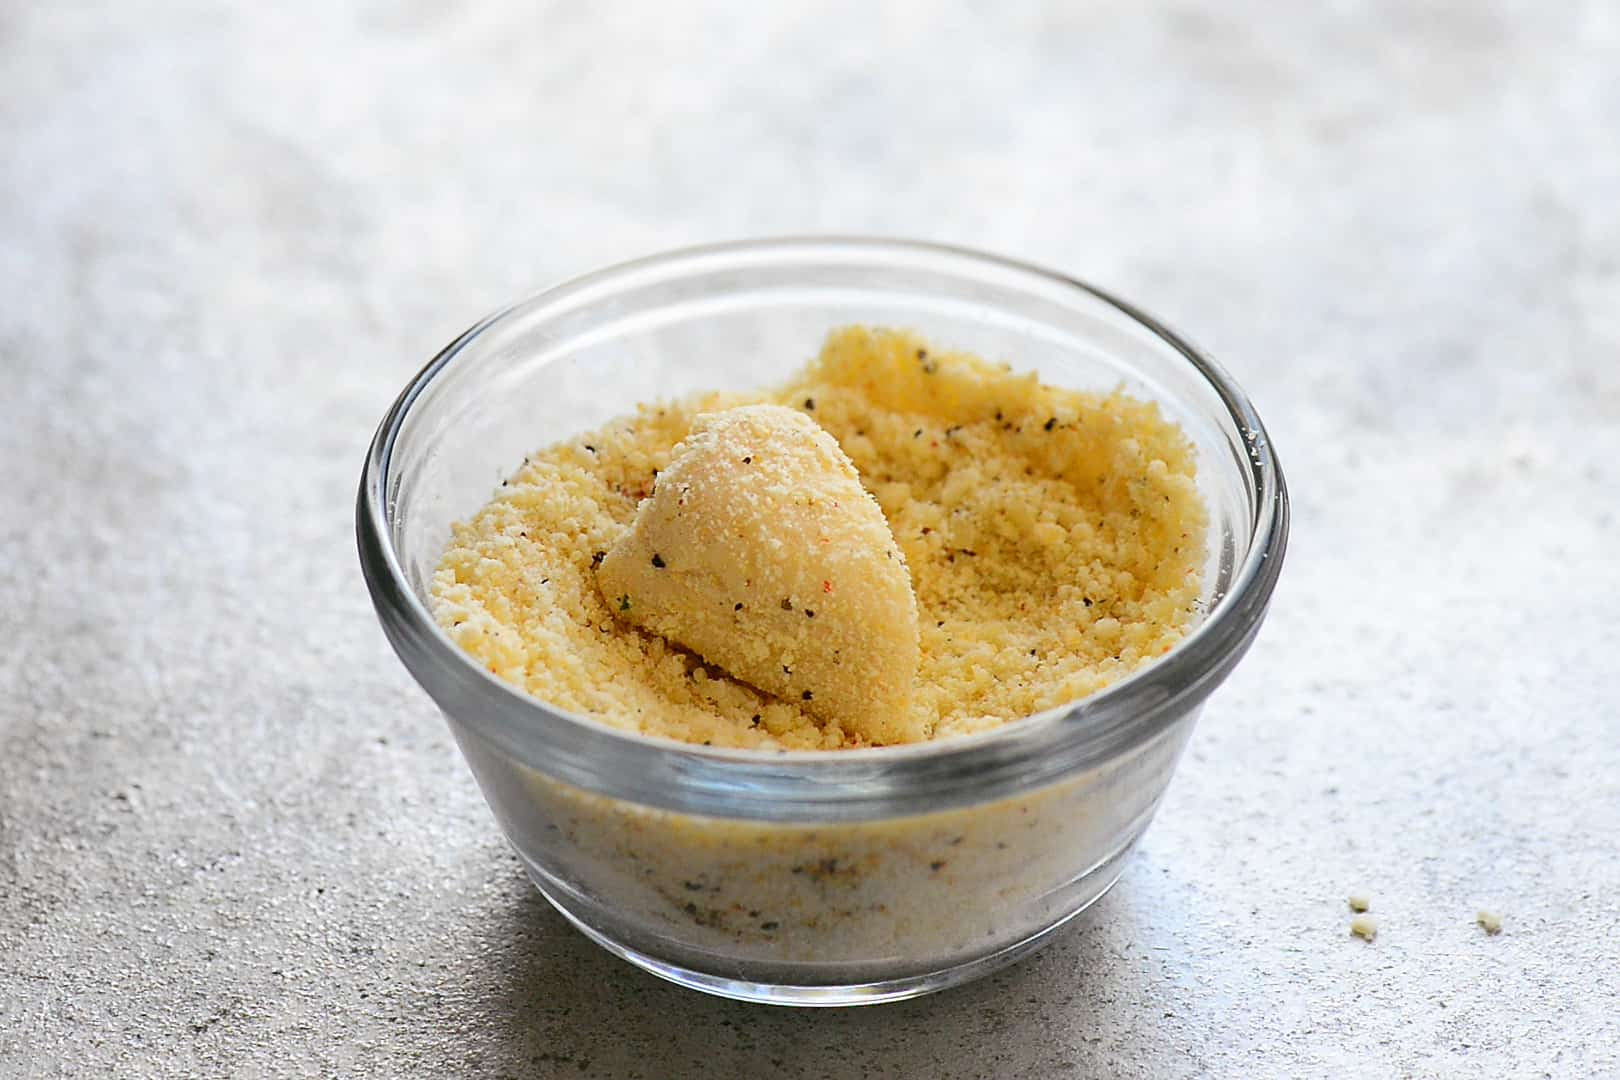 a piece of dough in a parmesan mixture